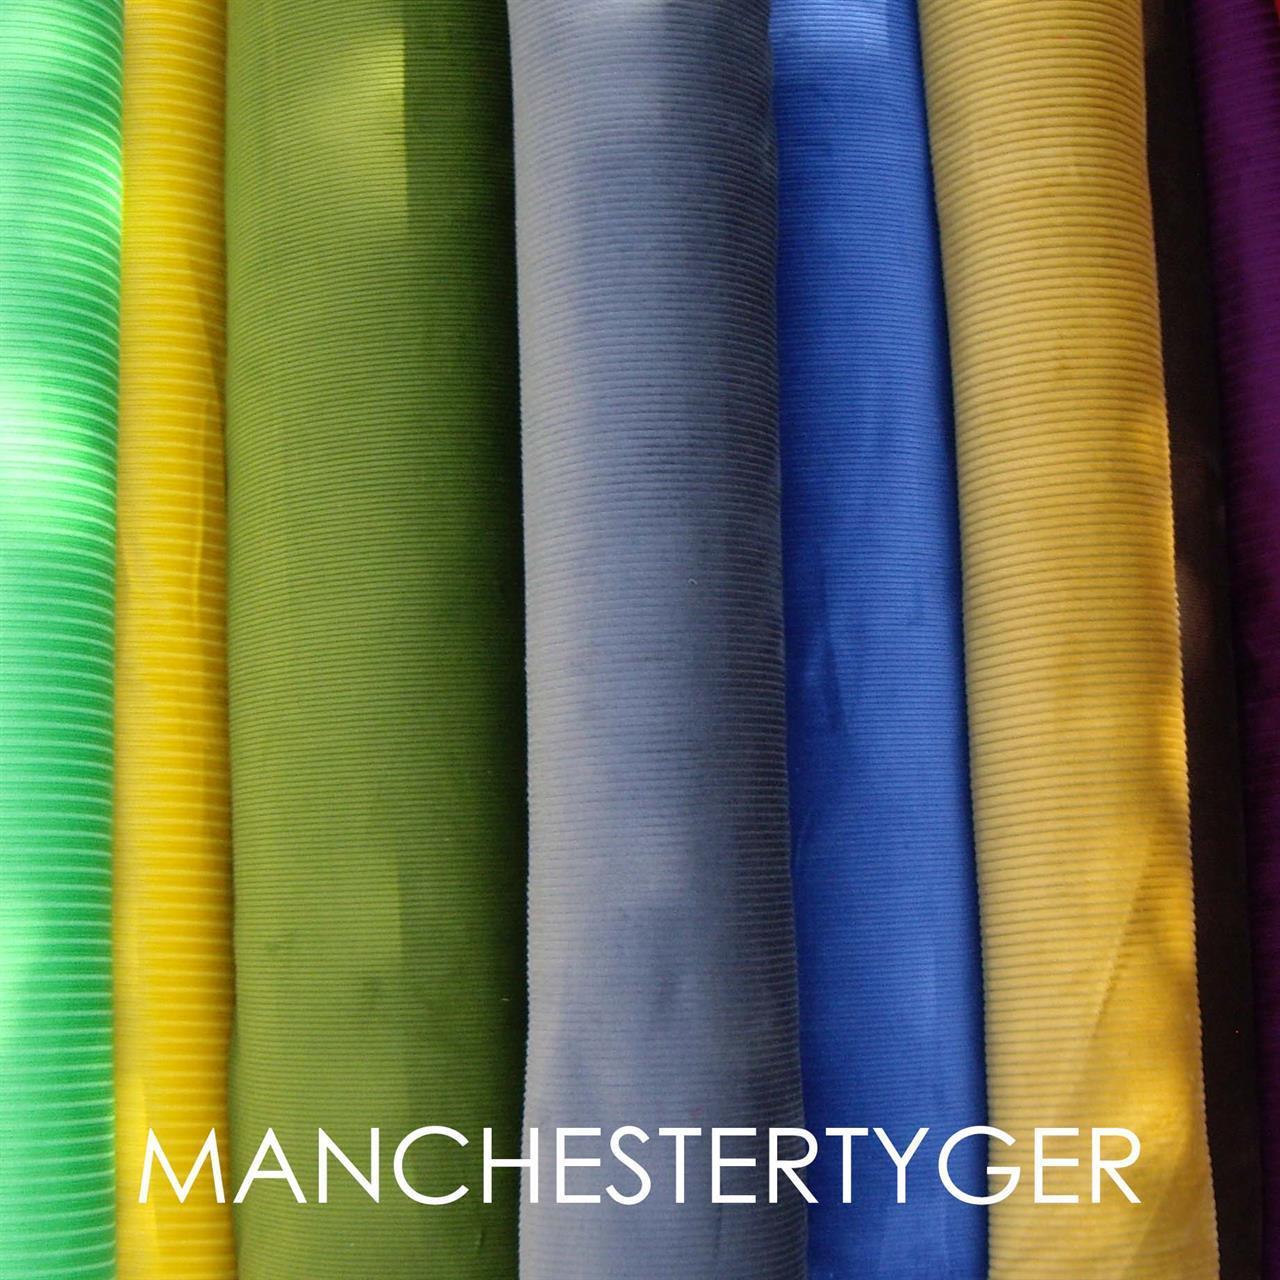 Manchestertyger